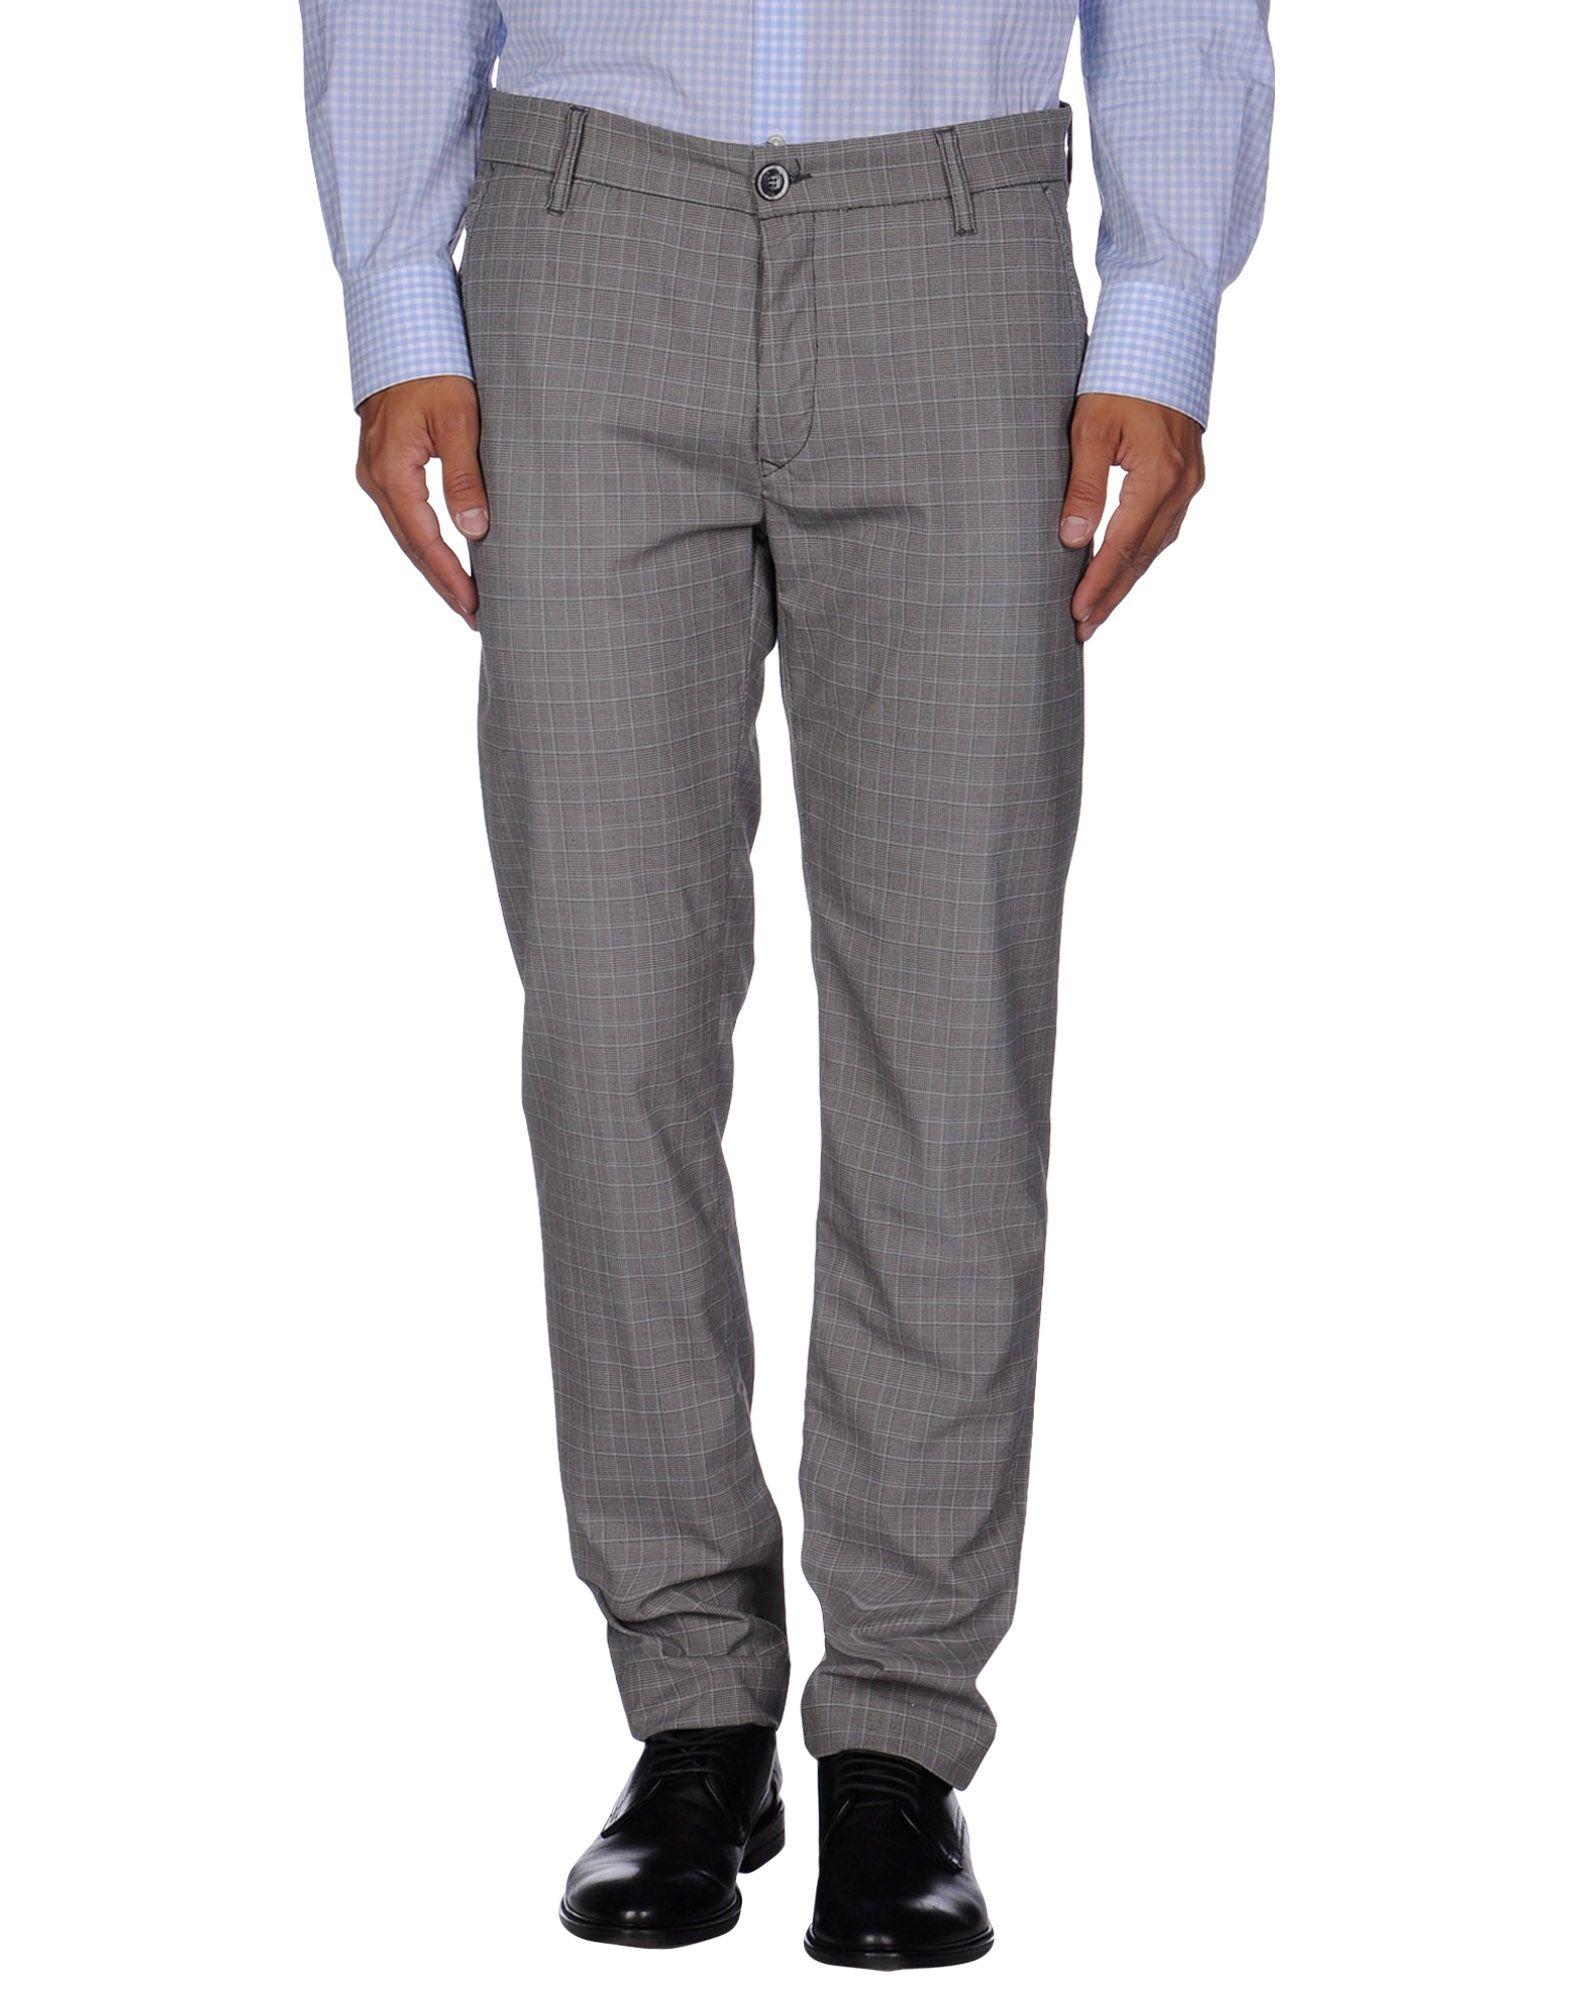 Cool Home Gt Bottoms Gt Black Gray Formal Pants Women Work Office Pants Women